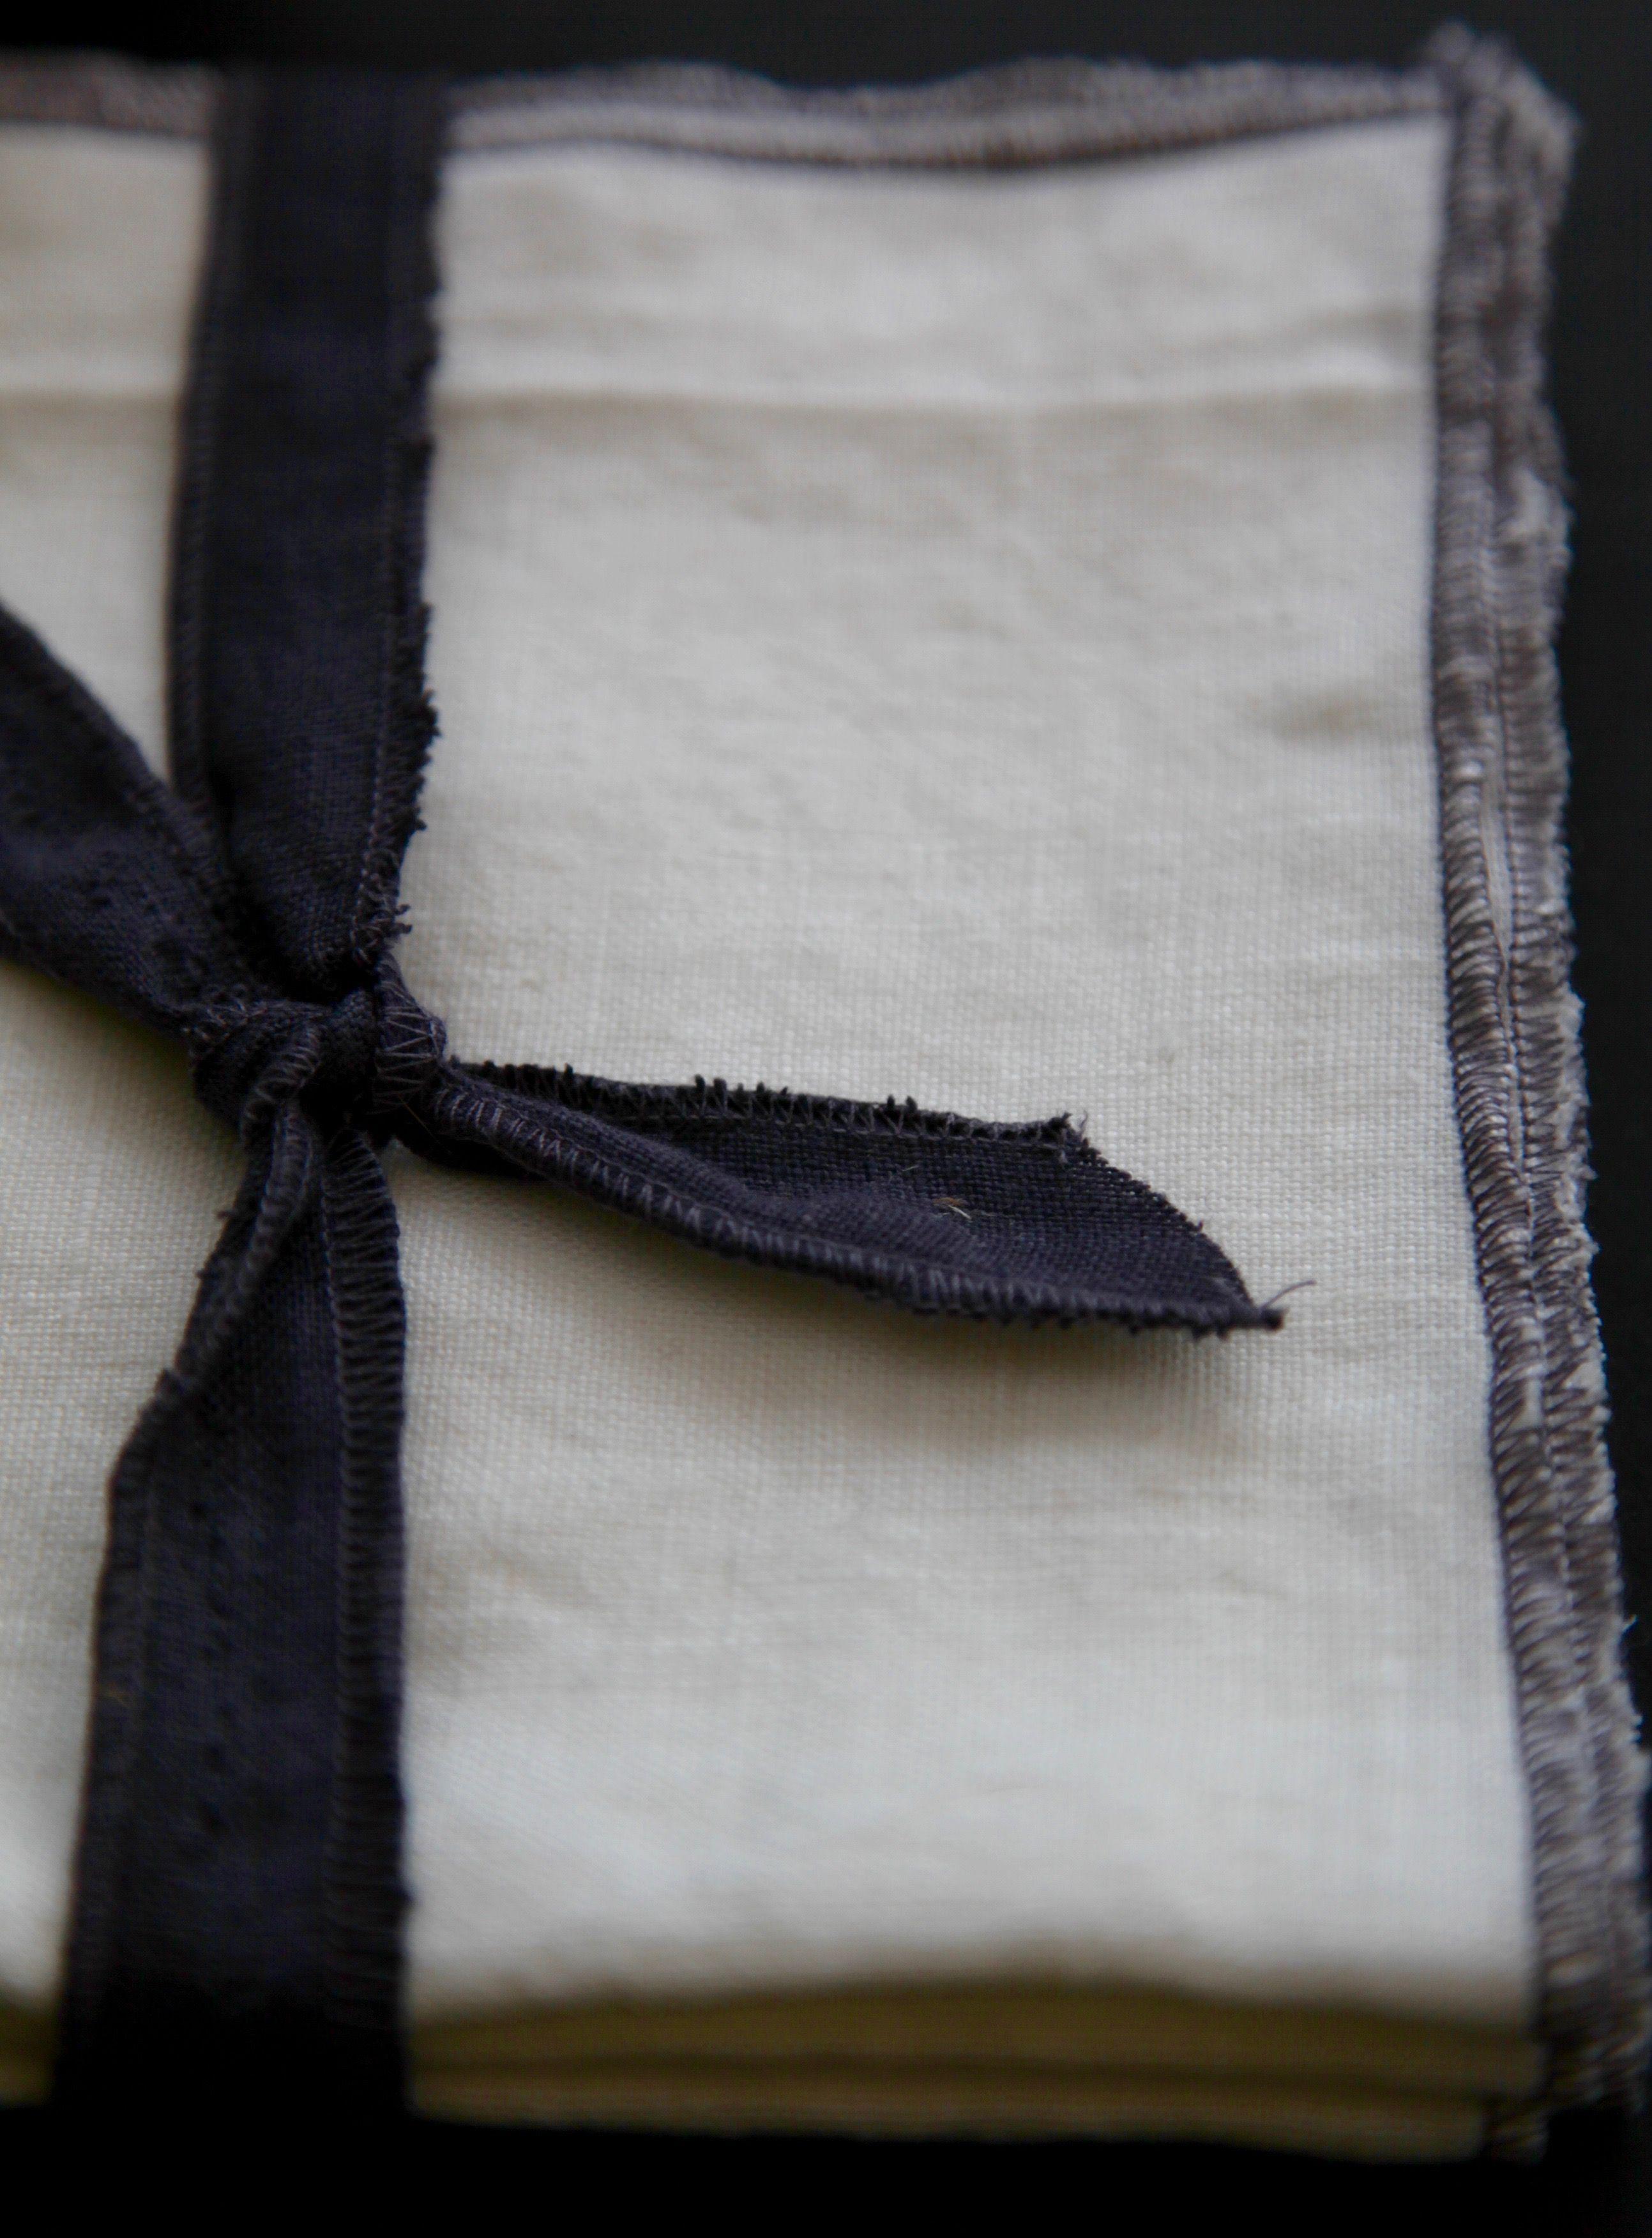 Linen Fabric Napkins In Natural Set Of 4 14 Inch Wedding Minimalist Kitchen Unpaper Napkins Housewarming Gift In 2020 Linen Fabric Fabric Napkin White Linen Napkins